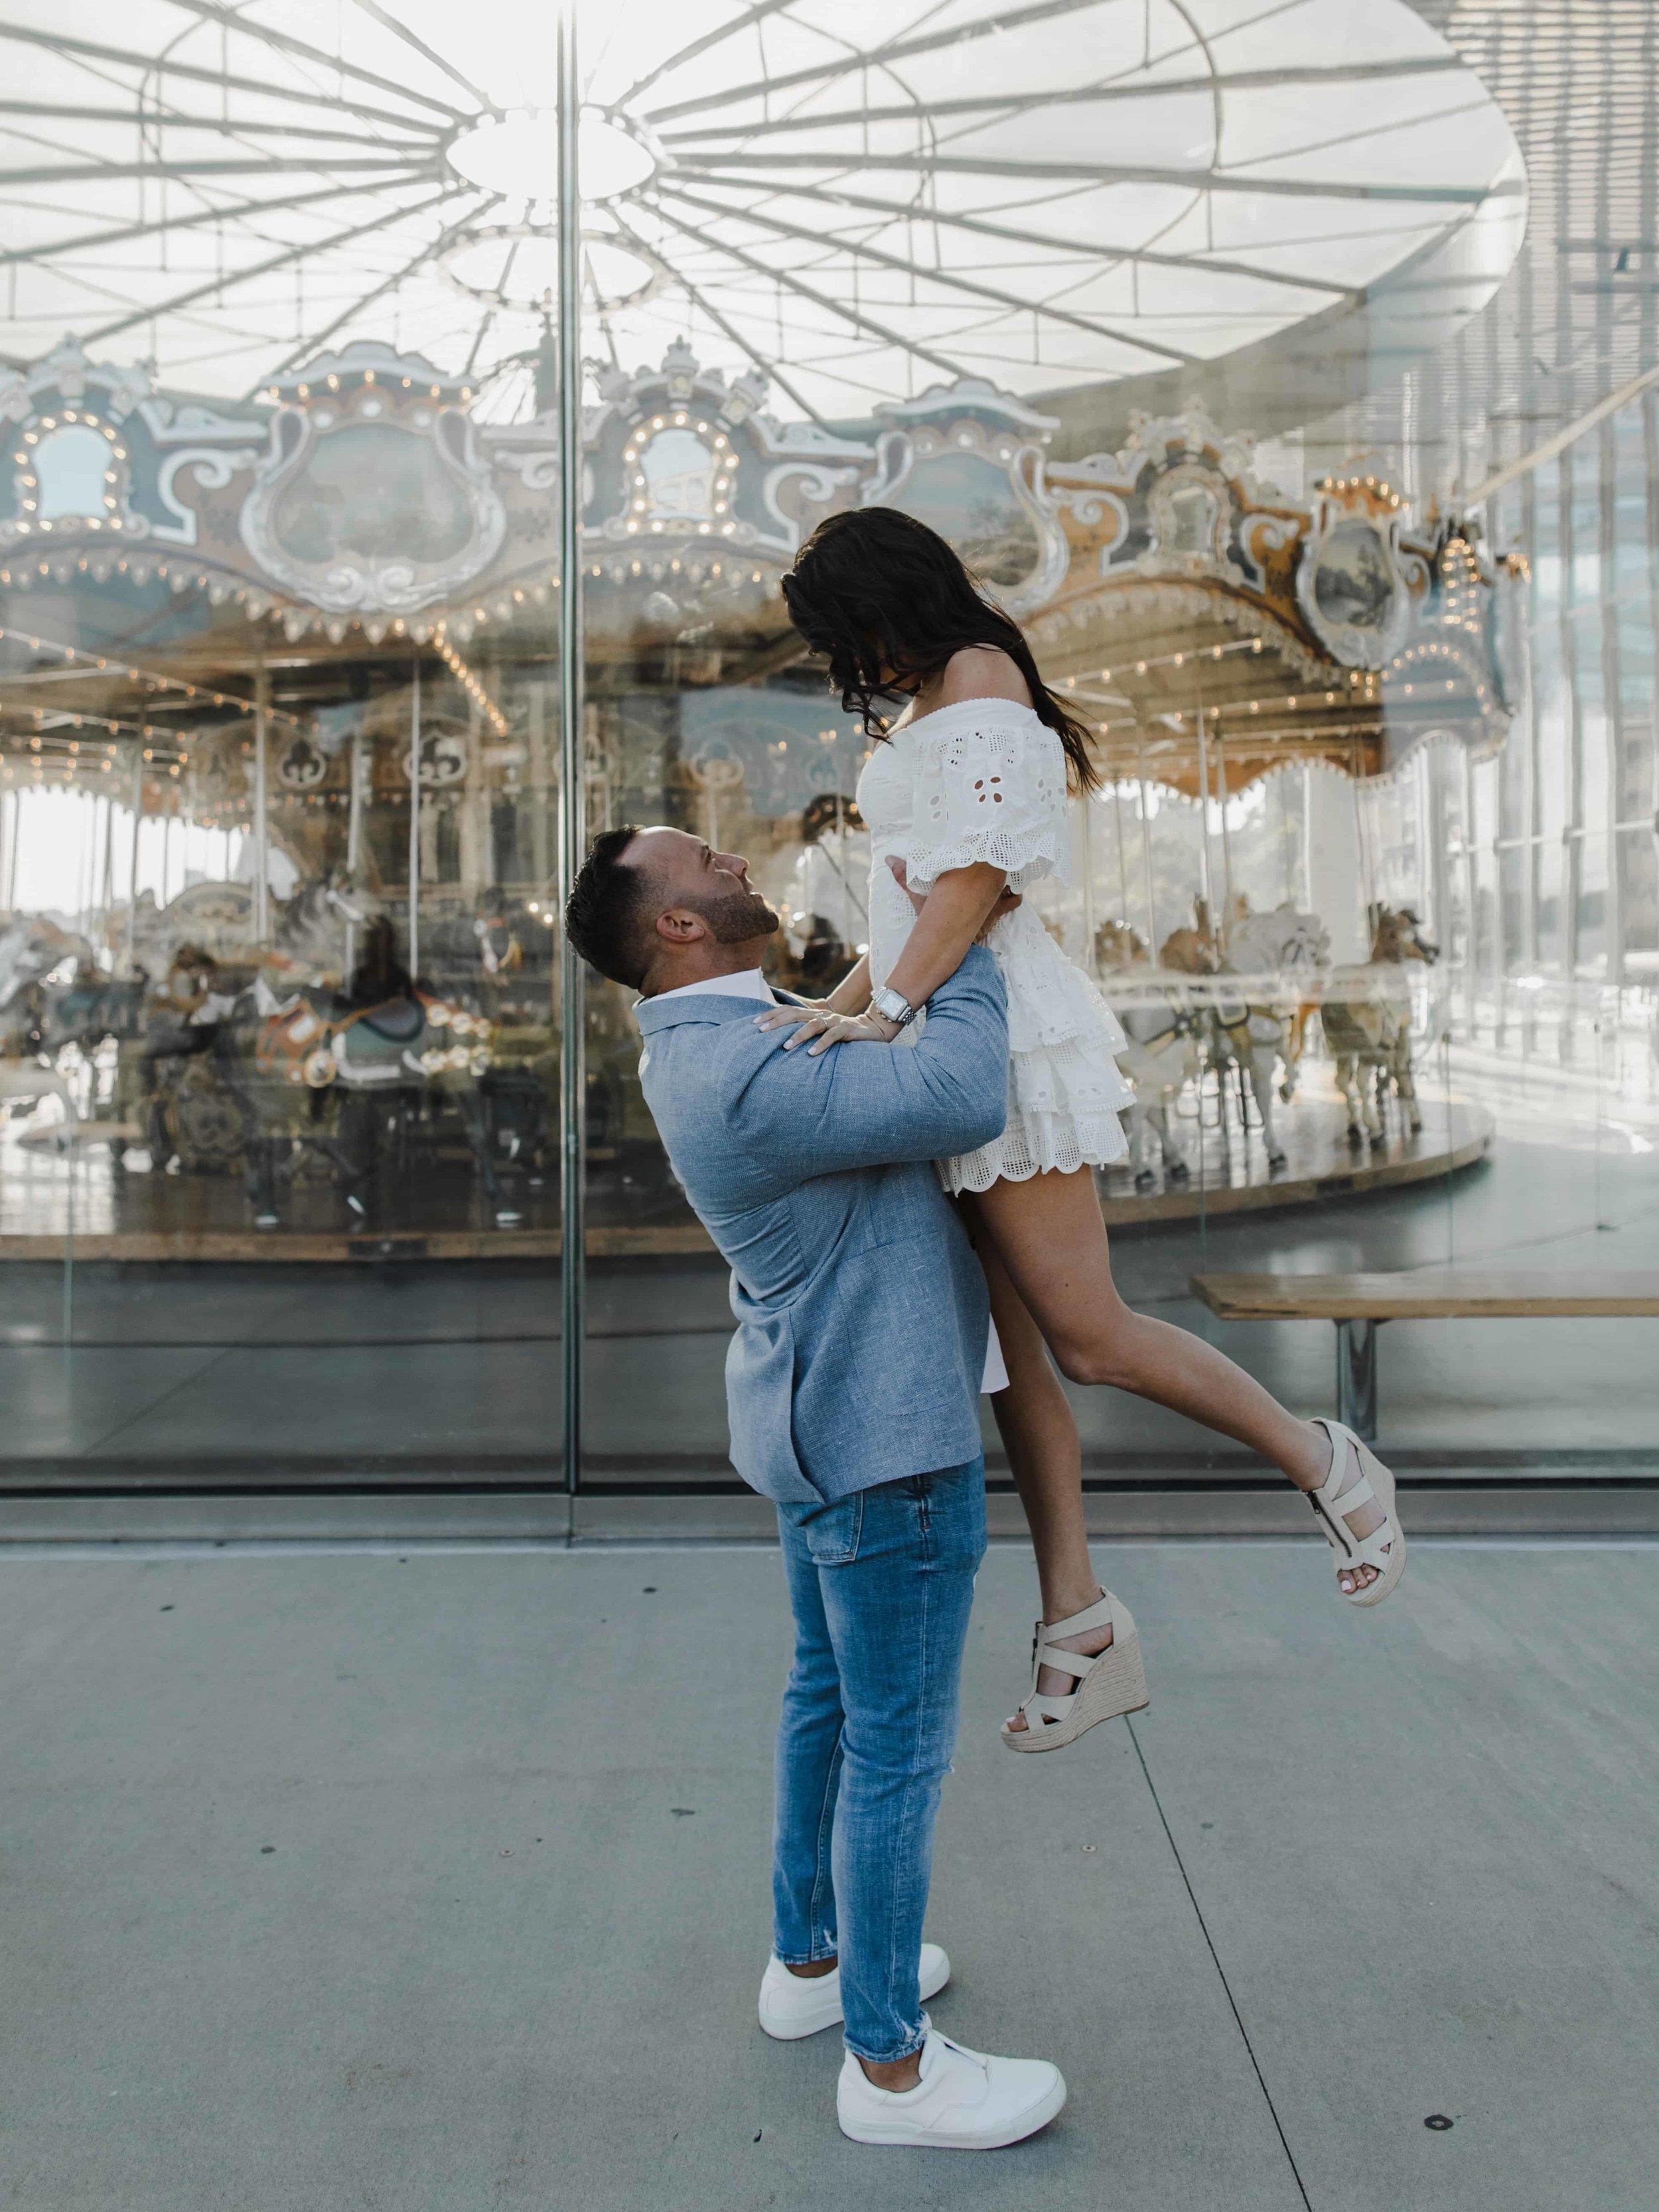 janes-carousel-engagement-photos.jpeg